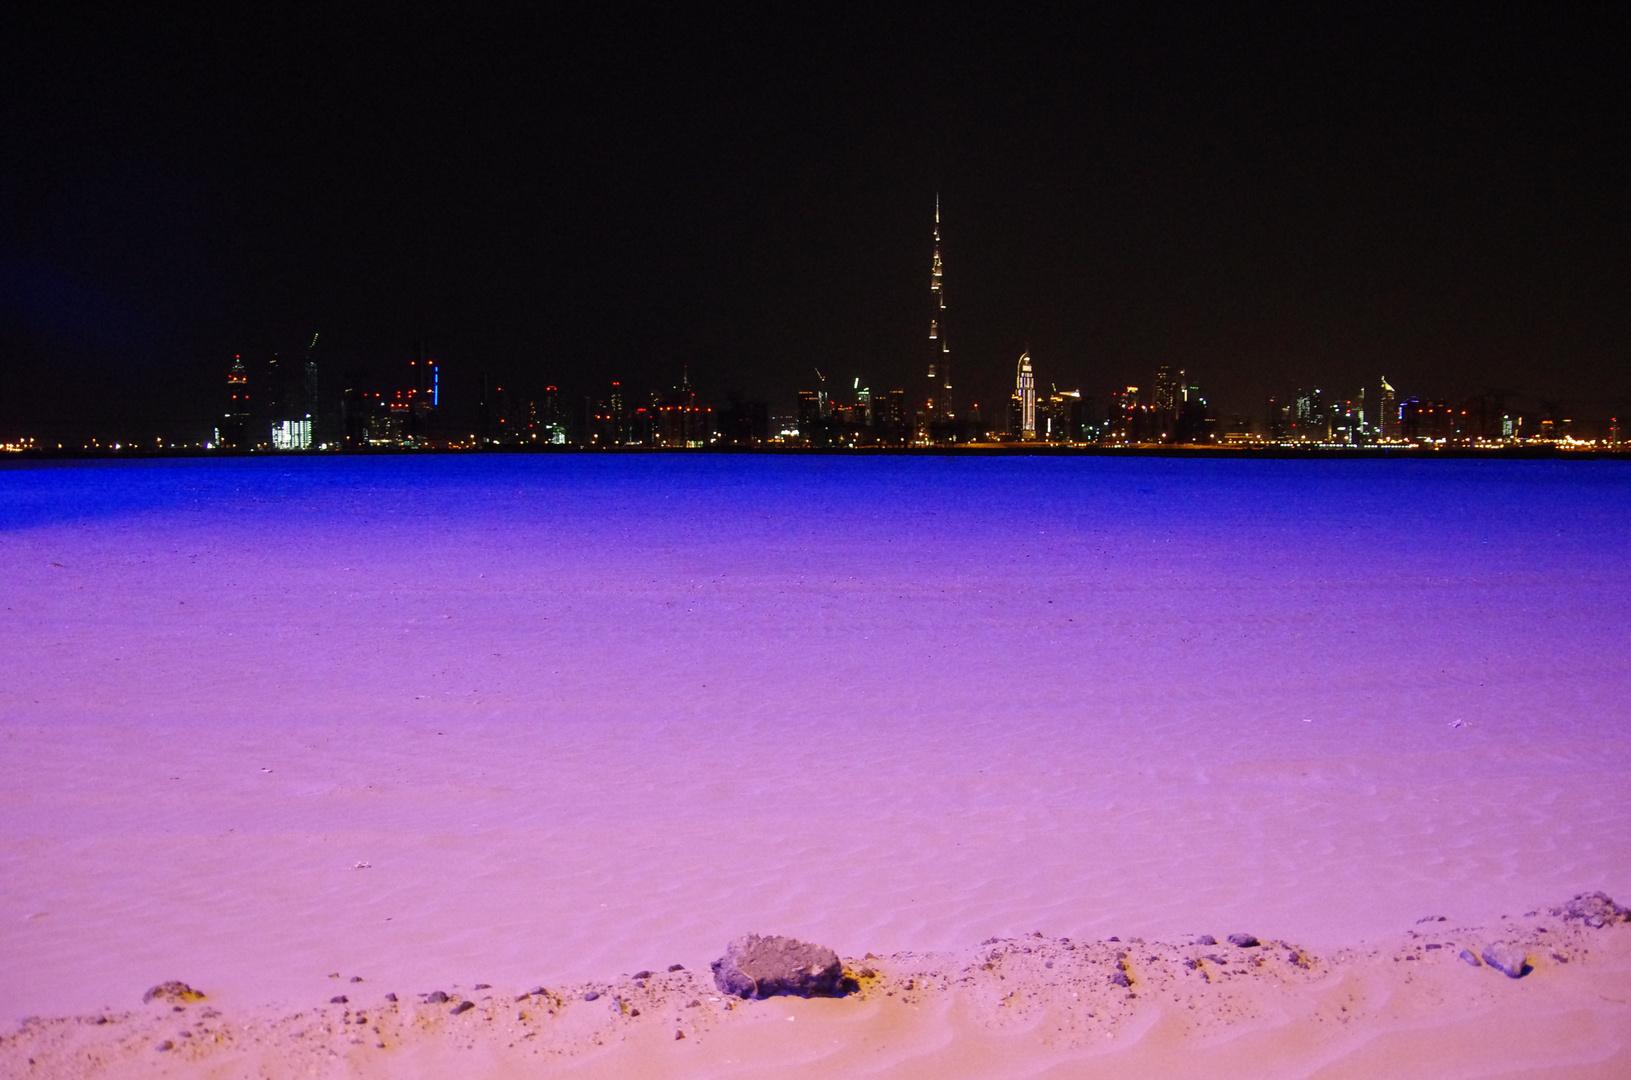 Sandy city